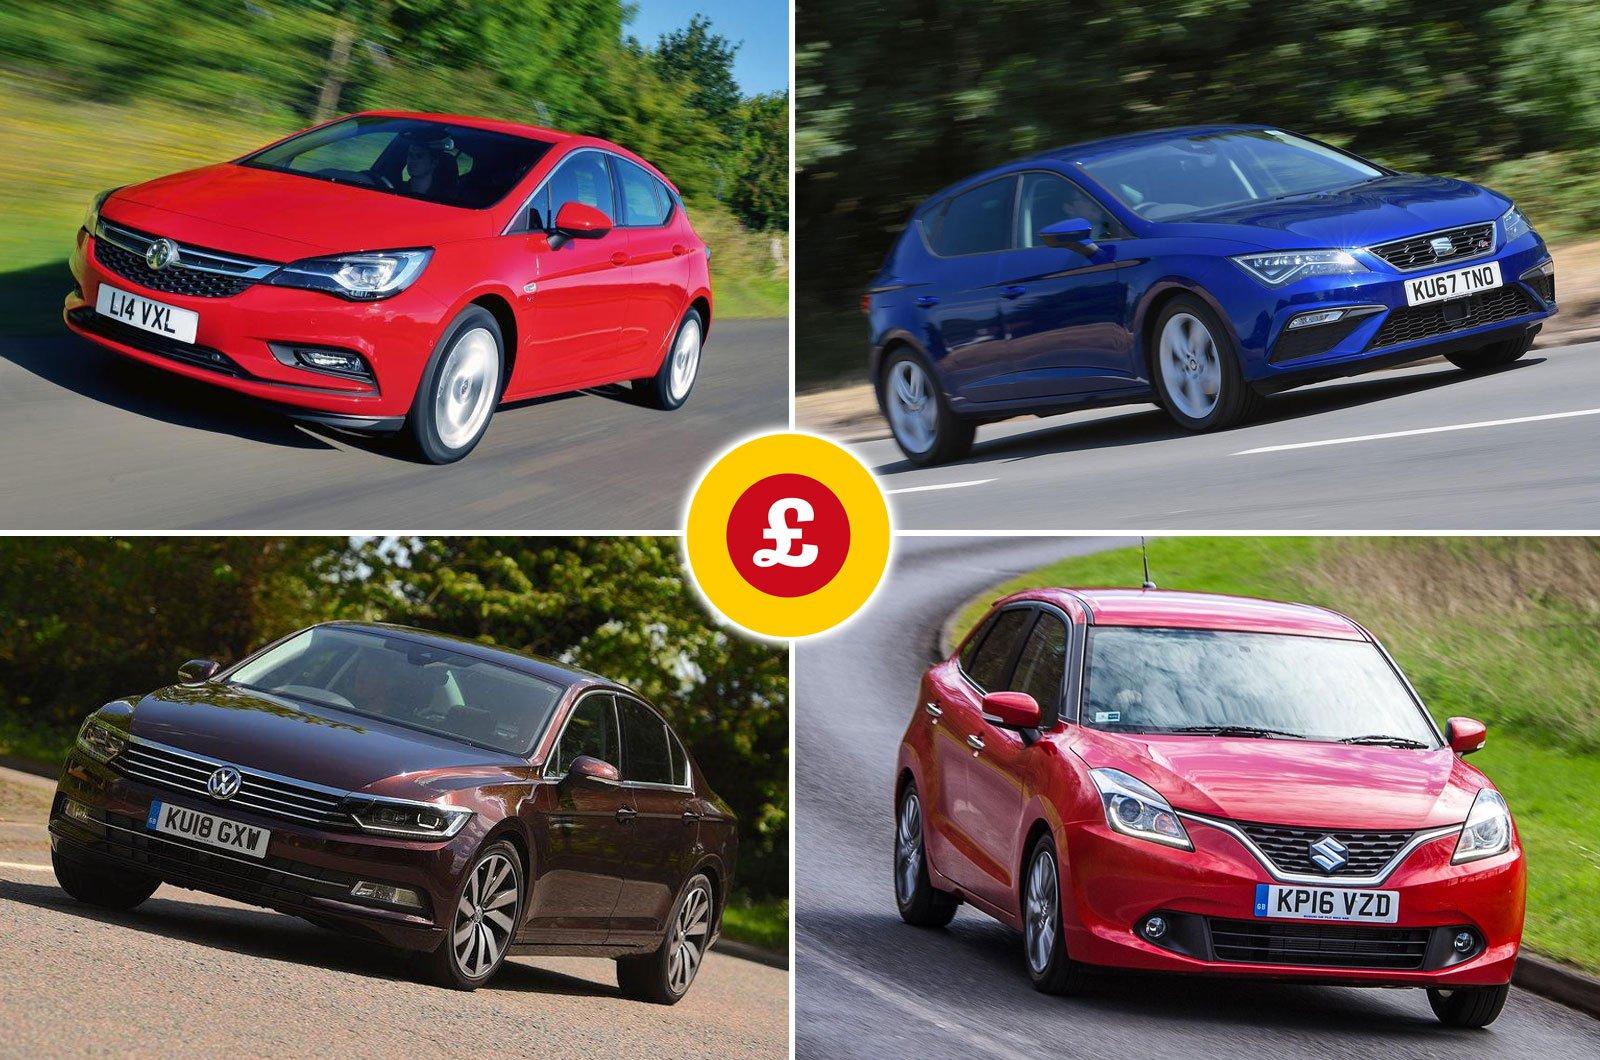 Vauxhall Astra, Seat Leon, Volkswagen Passat, Suzuki Baleno